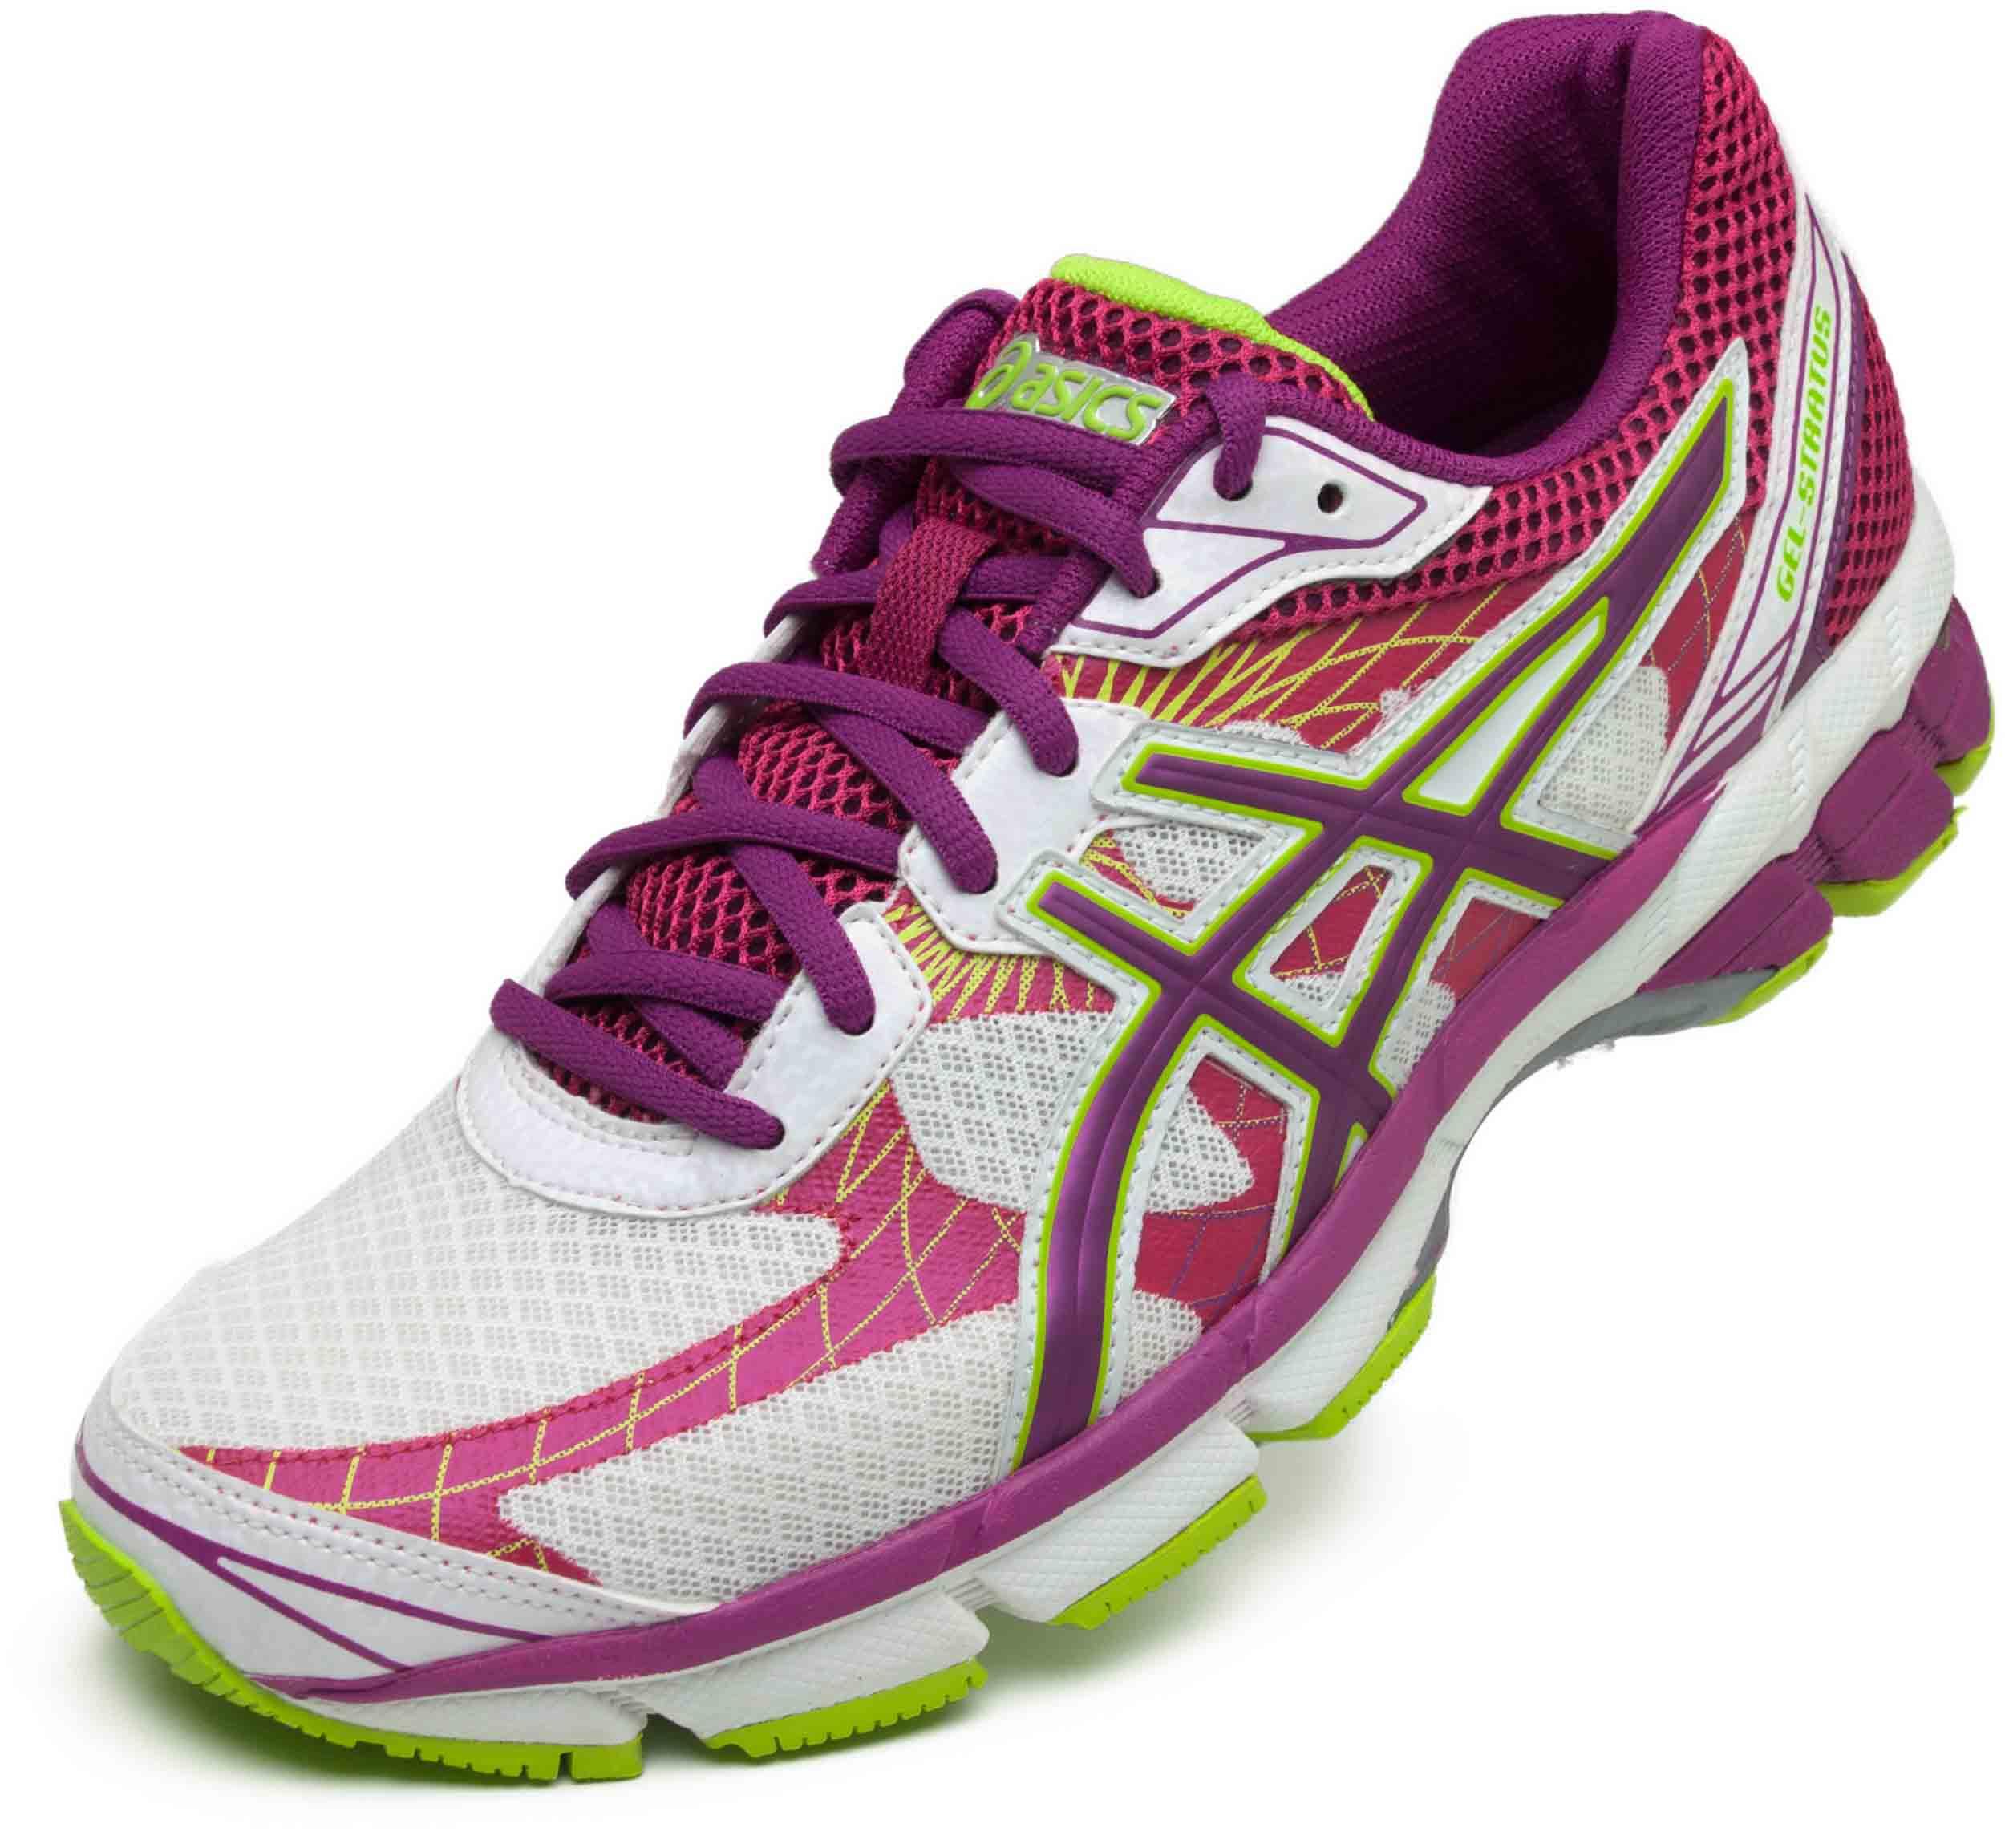 4c778e1ef41 Dámská běžecká obuv Asics Gel-Stratus